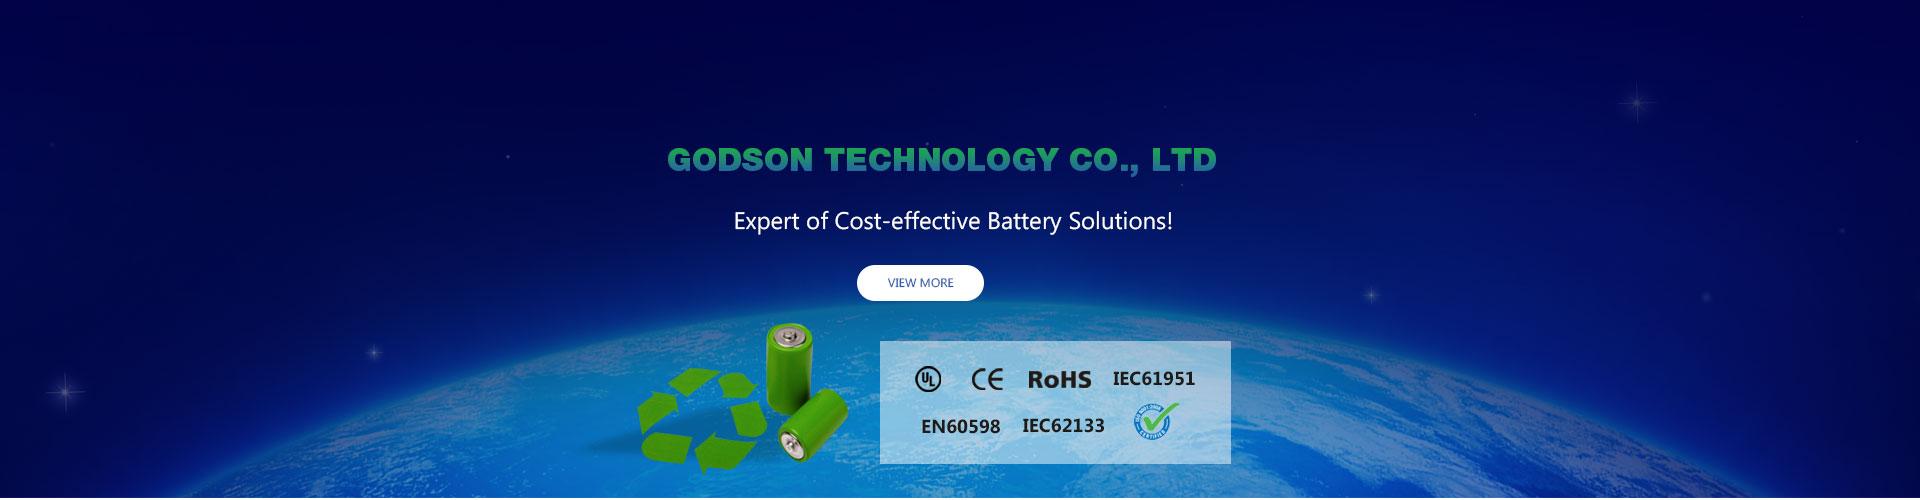 Godson Technology Co.,Ltd Main Image